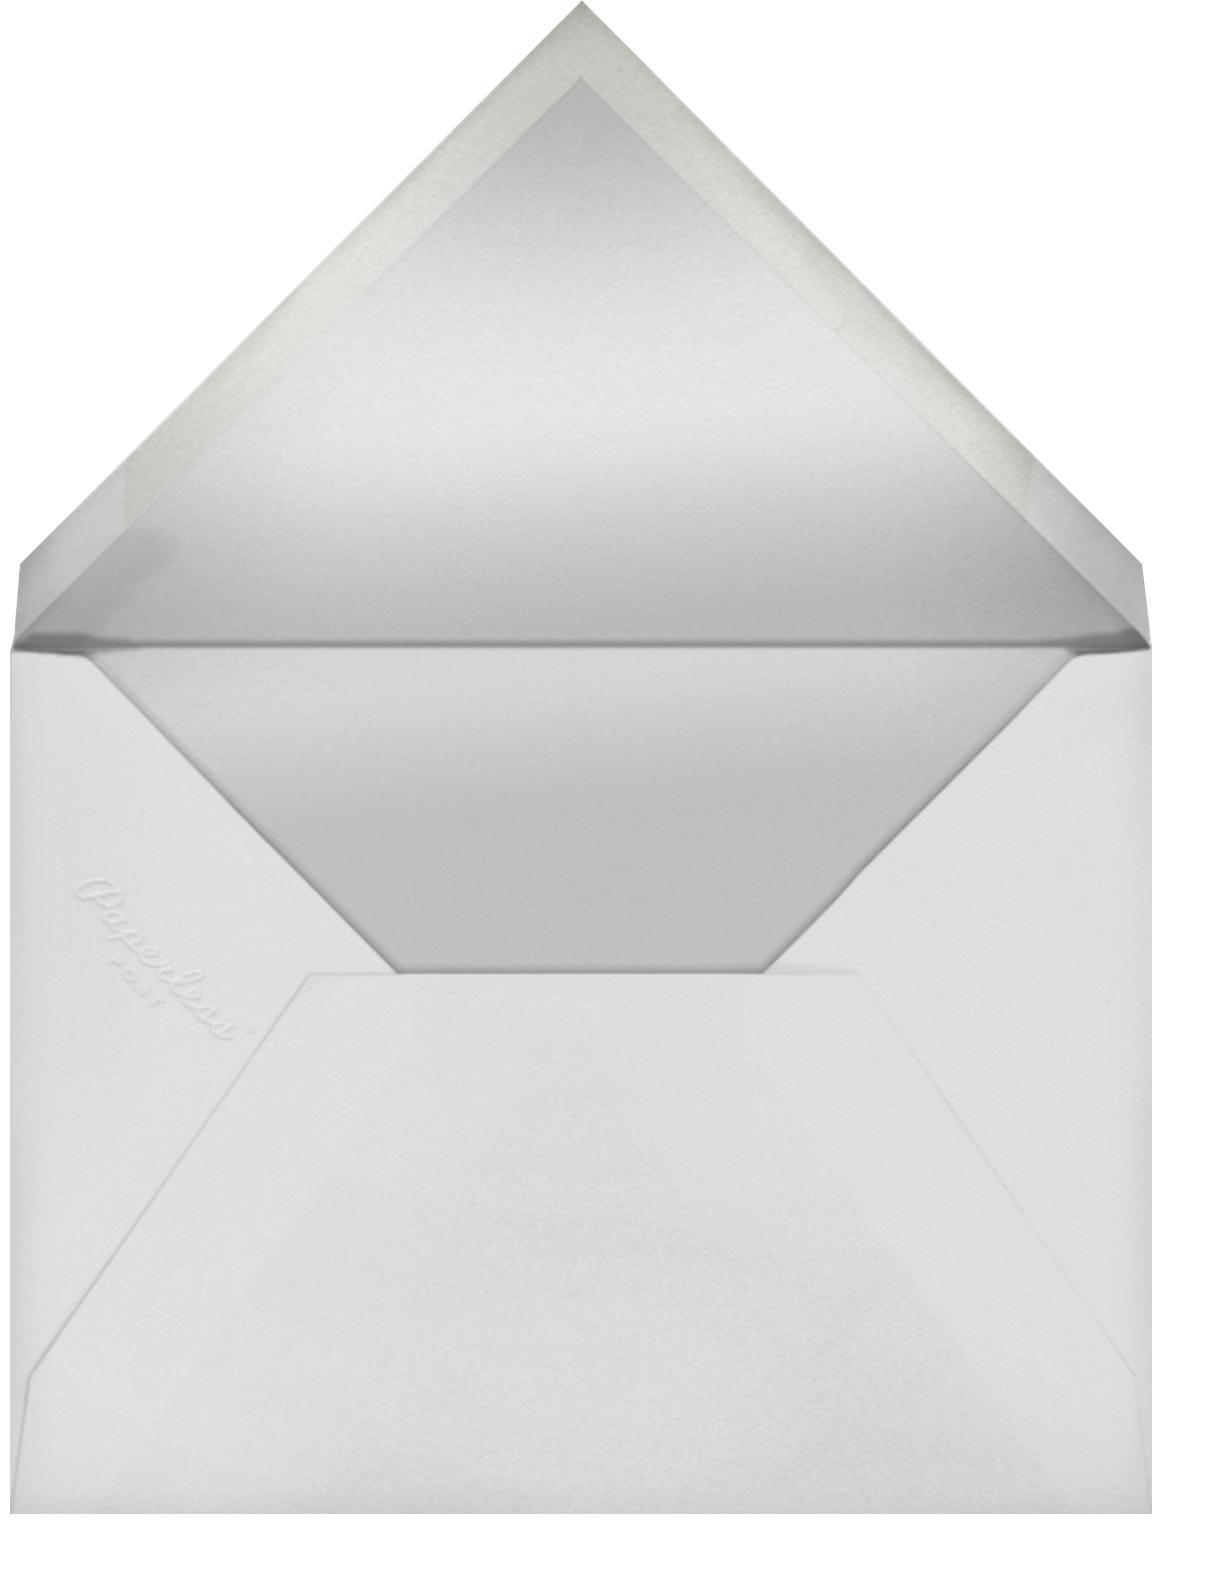 Iconic Bride & Groom (Program) - White/Charcoal - Paperless Post - Menus and programs - envelope back